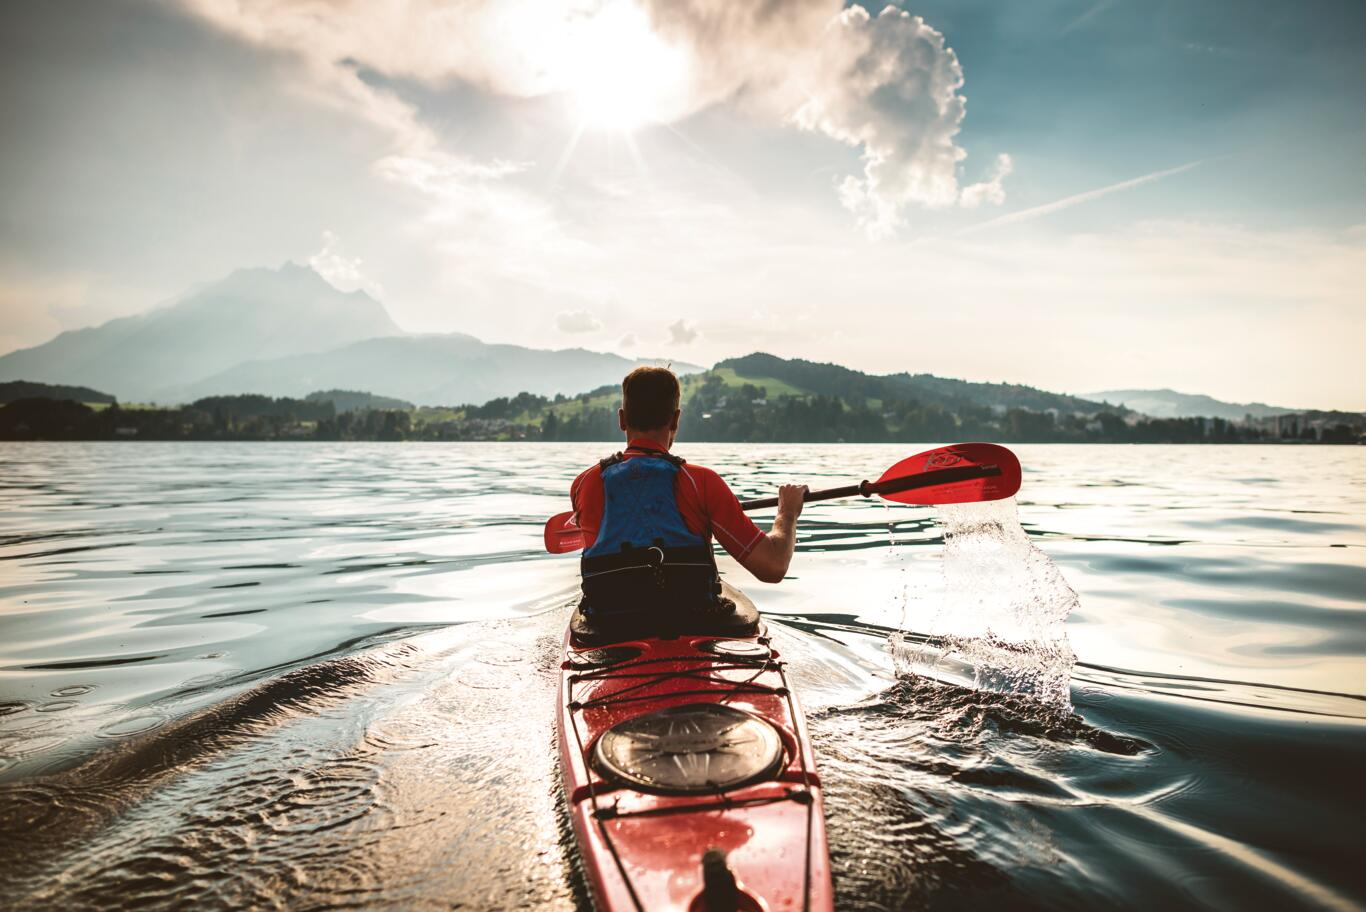 SEG canooing leisure sports